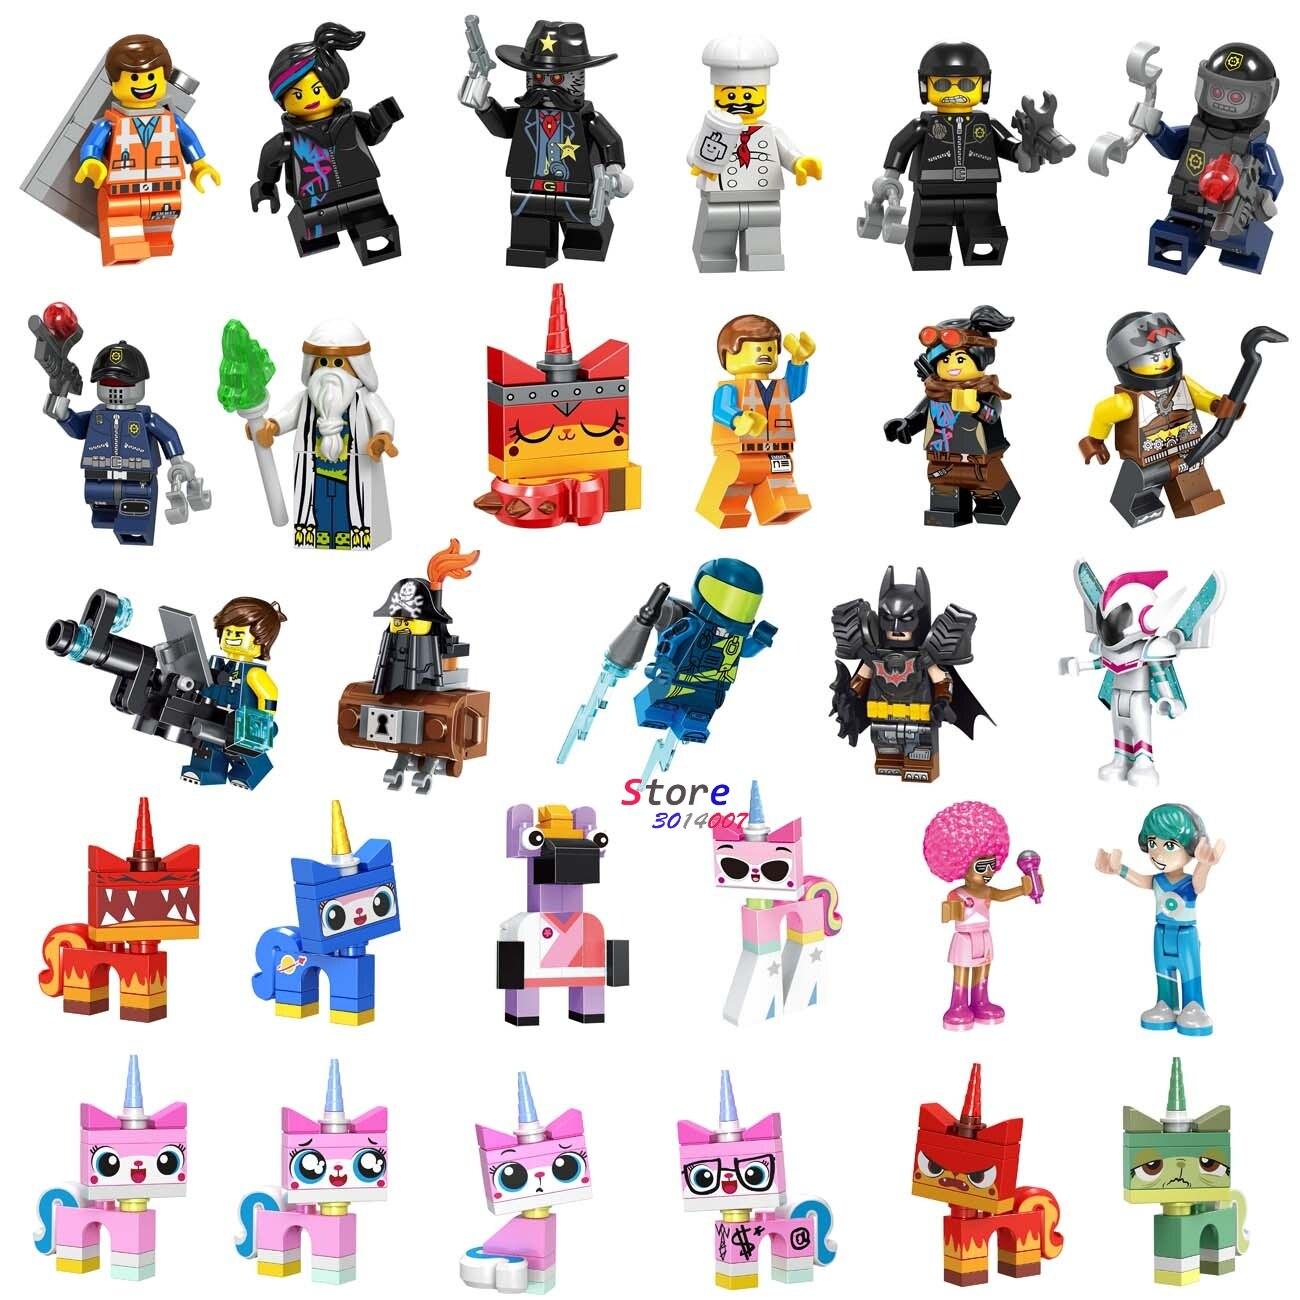 Single Building Blocks MOVIE 2 Series Emmet REX Ultrakatty Lucy Batman Metalbeard Sweet Mayhem Toys For Children